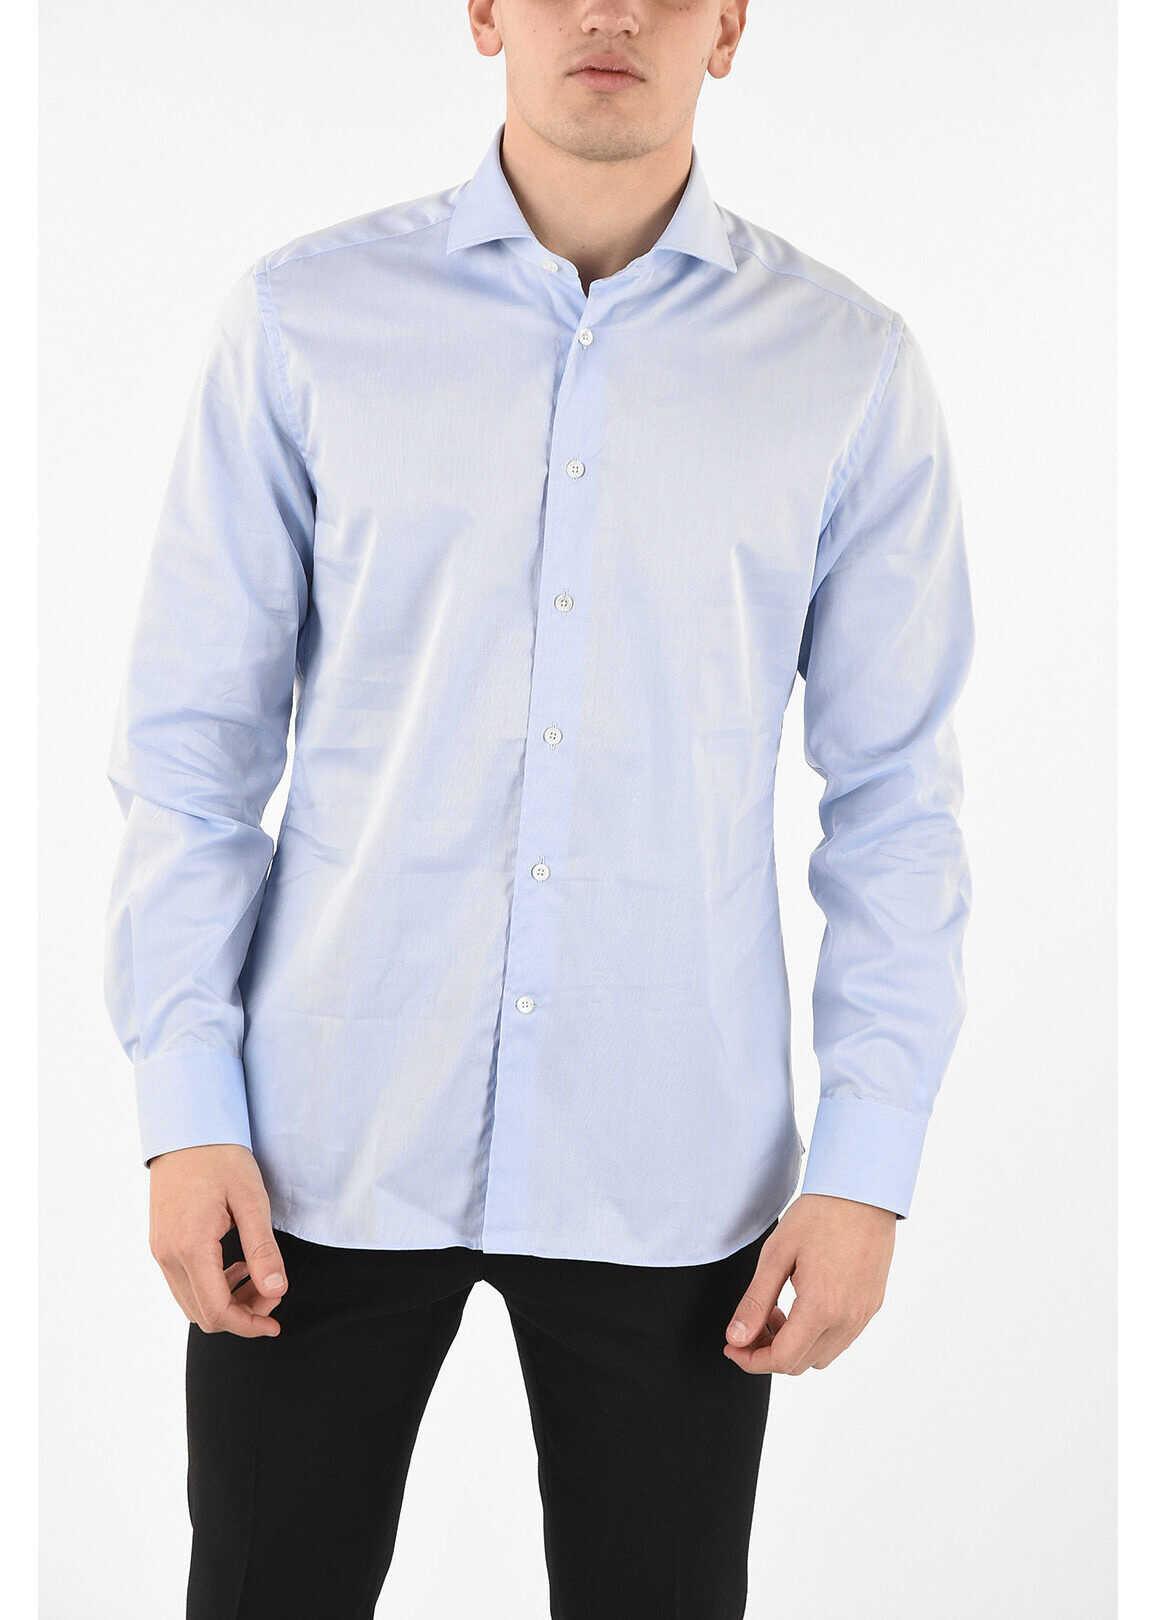 CORNELIANI popeline spread collar shirt LIGHT BLUE imagine